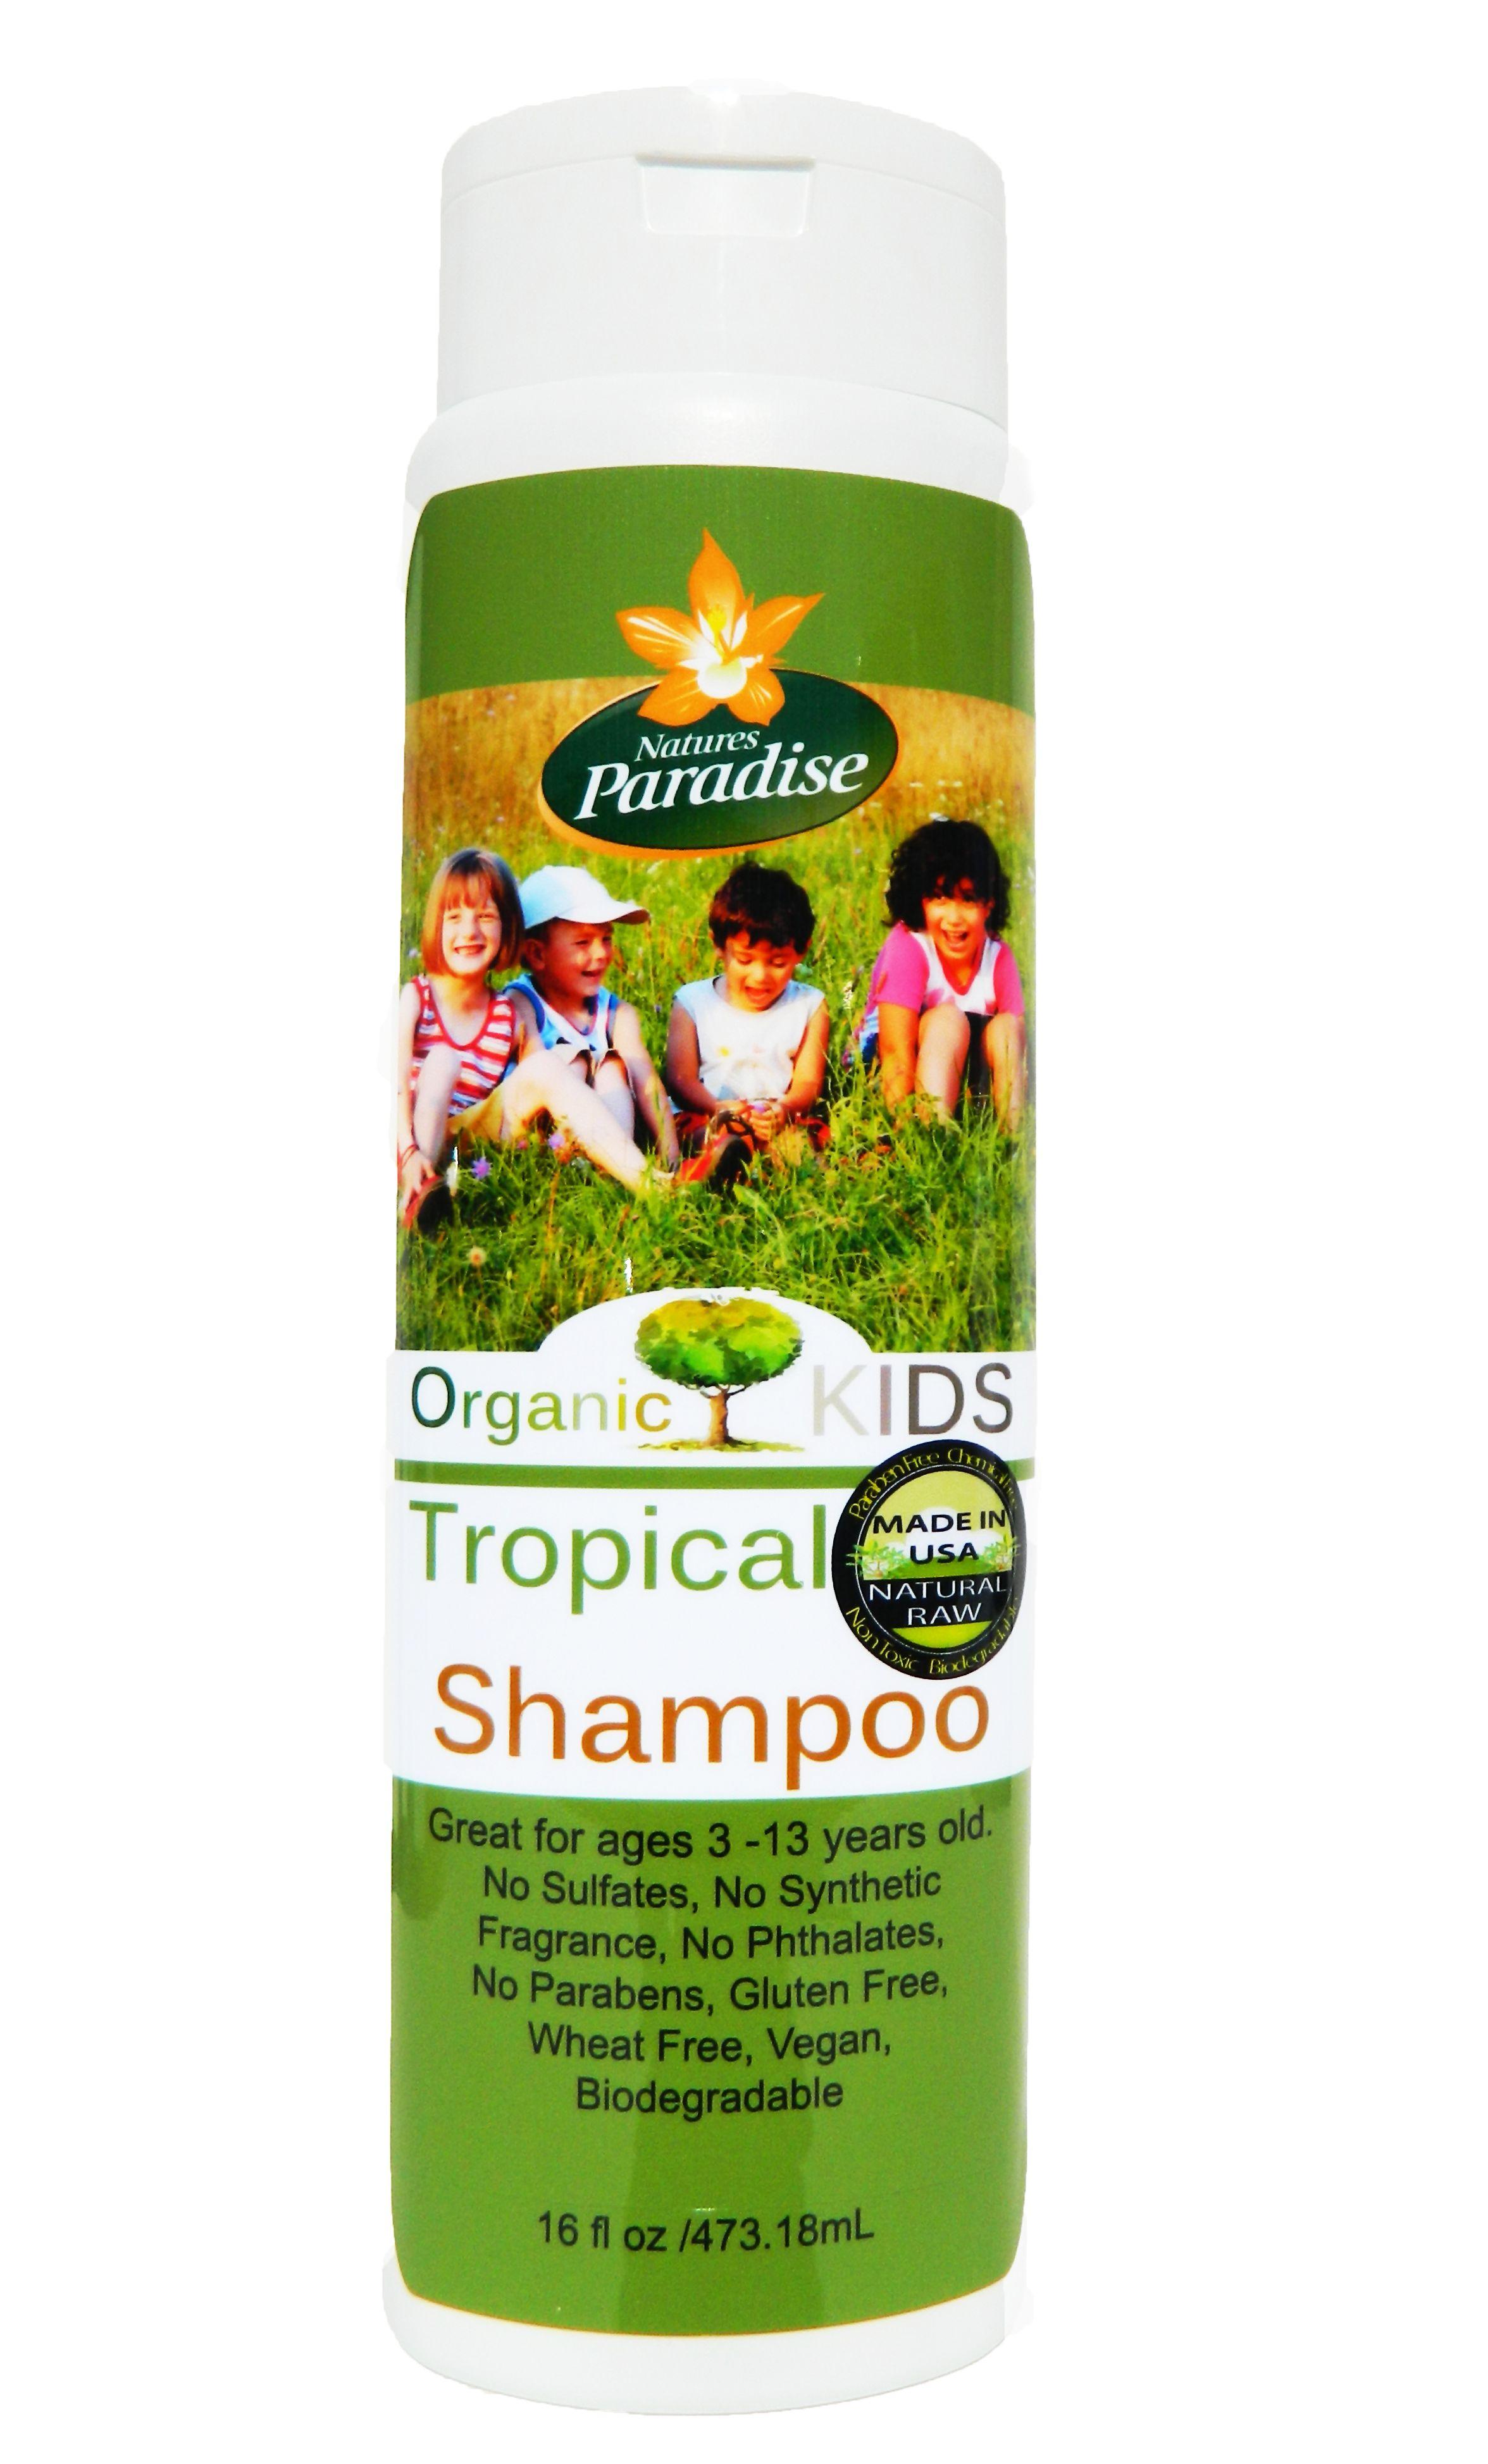 Organic KIDS- Sulfate Free Hair Shampoo 16oz